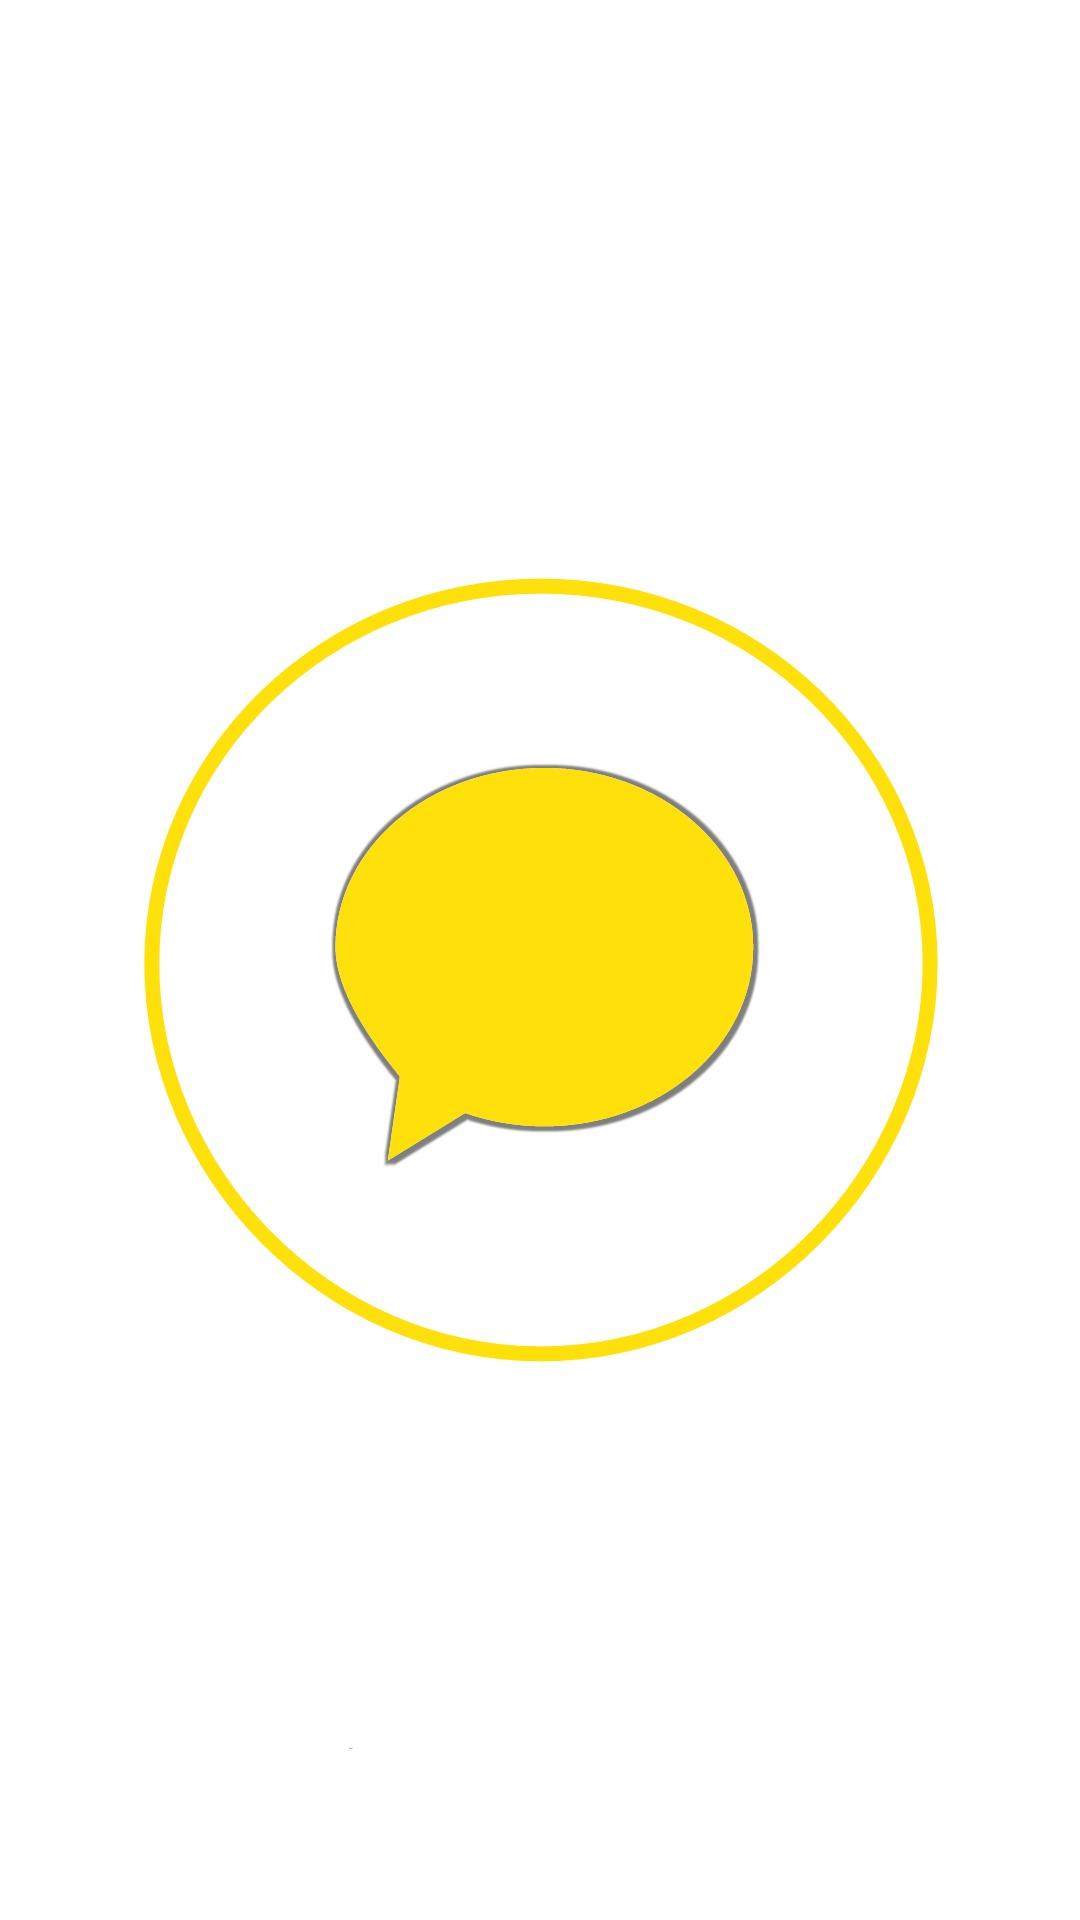 Instagram-cover-tool-chat-lotnotes.com.jpg